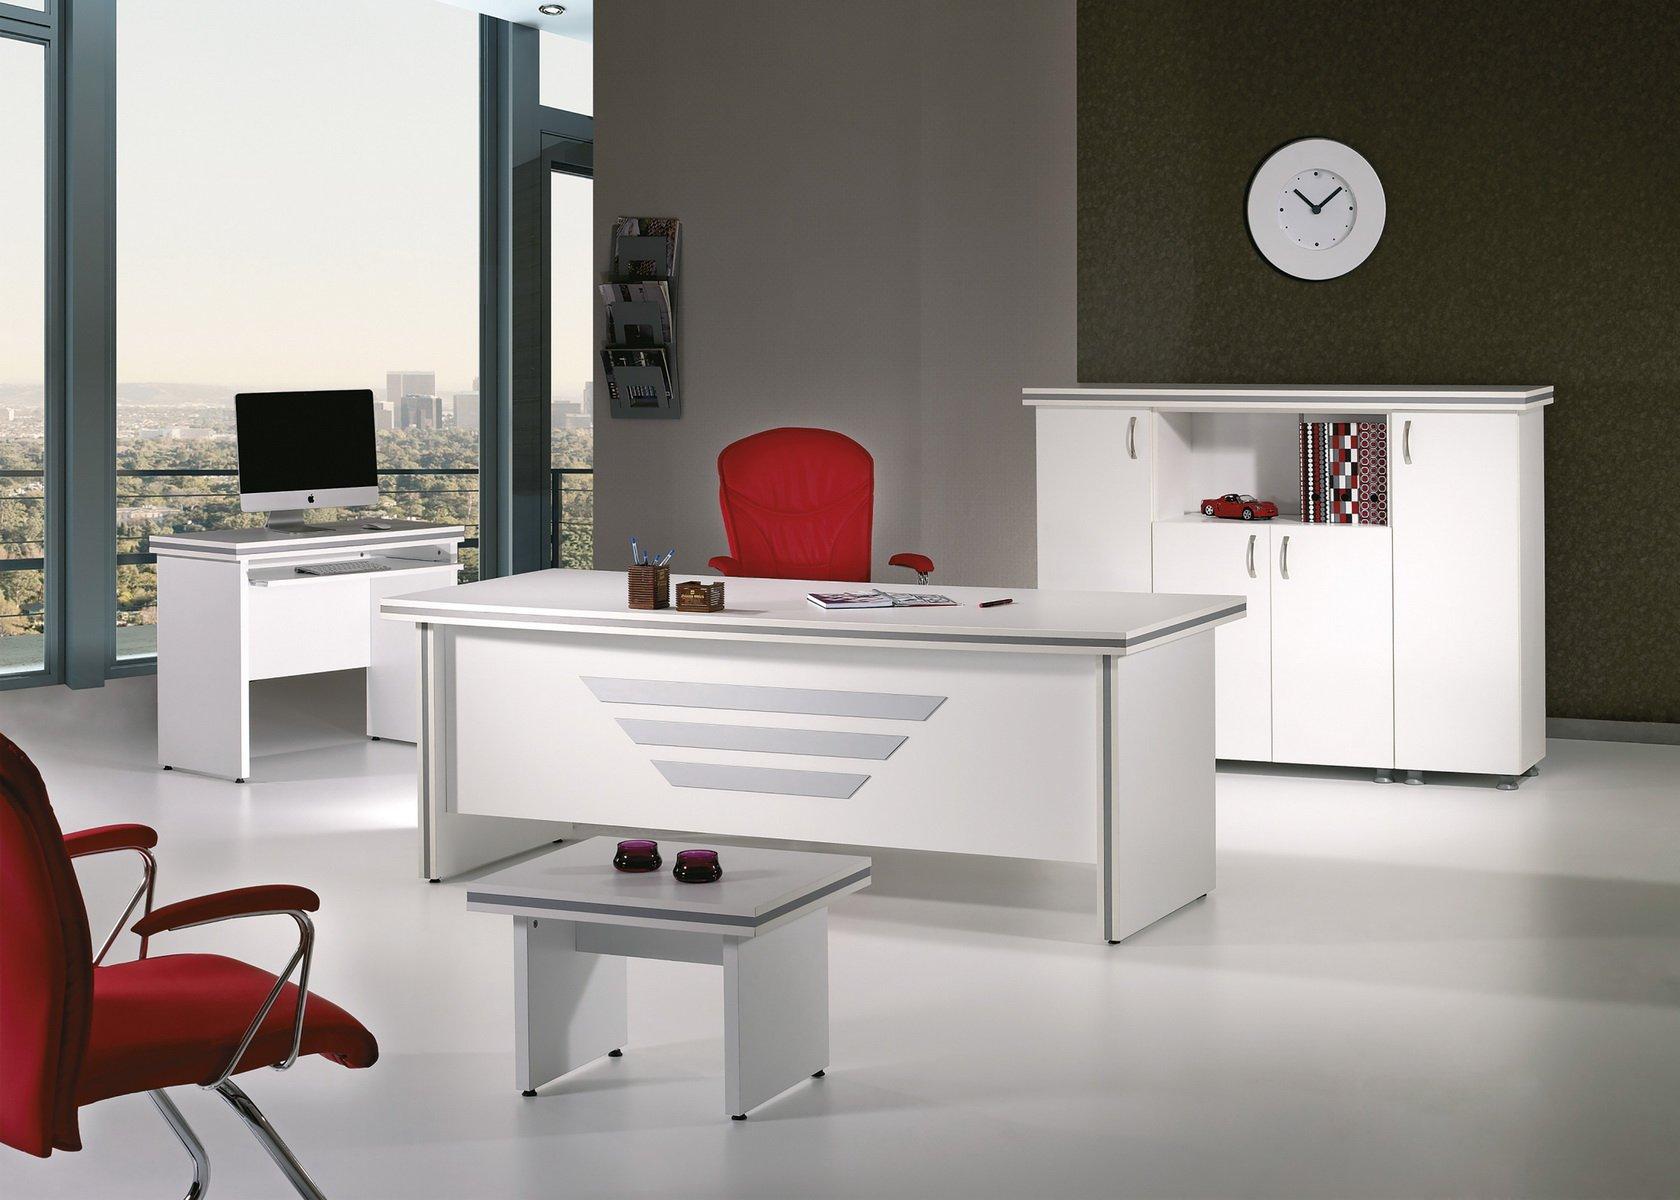 Modern New Star 5 Piece Desk Office Suite Furniture Set 79'' White